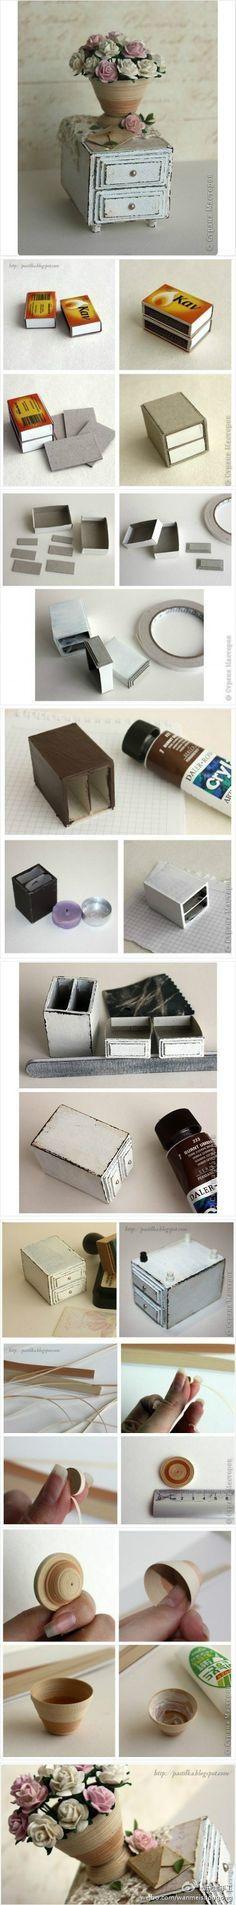 neat idea #diy #crafts www.BlueRainbowDesign.com